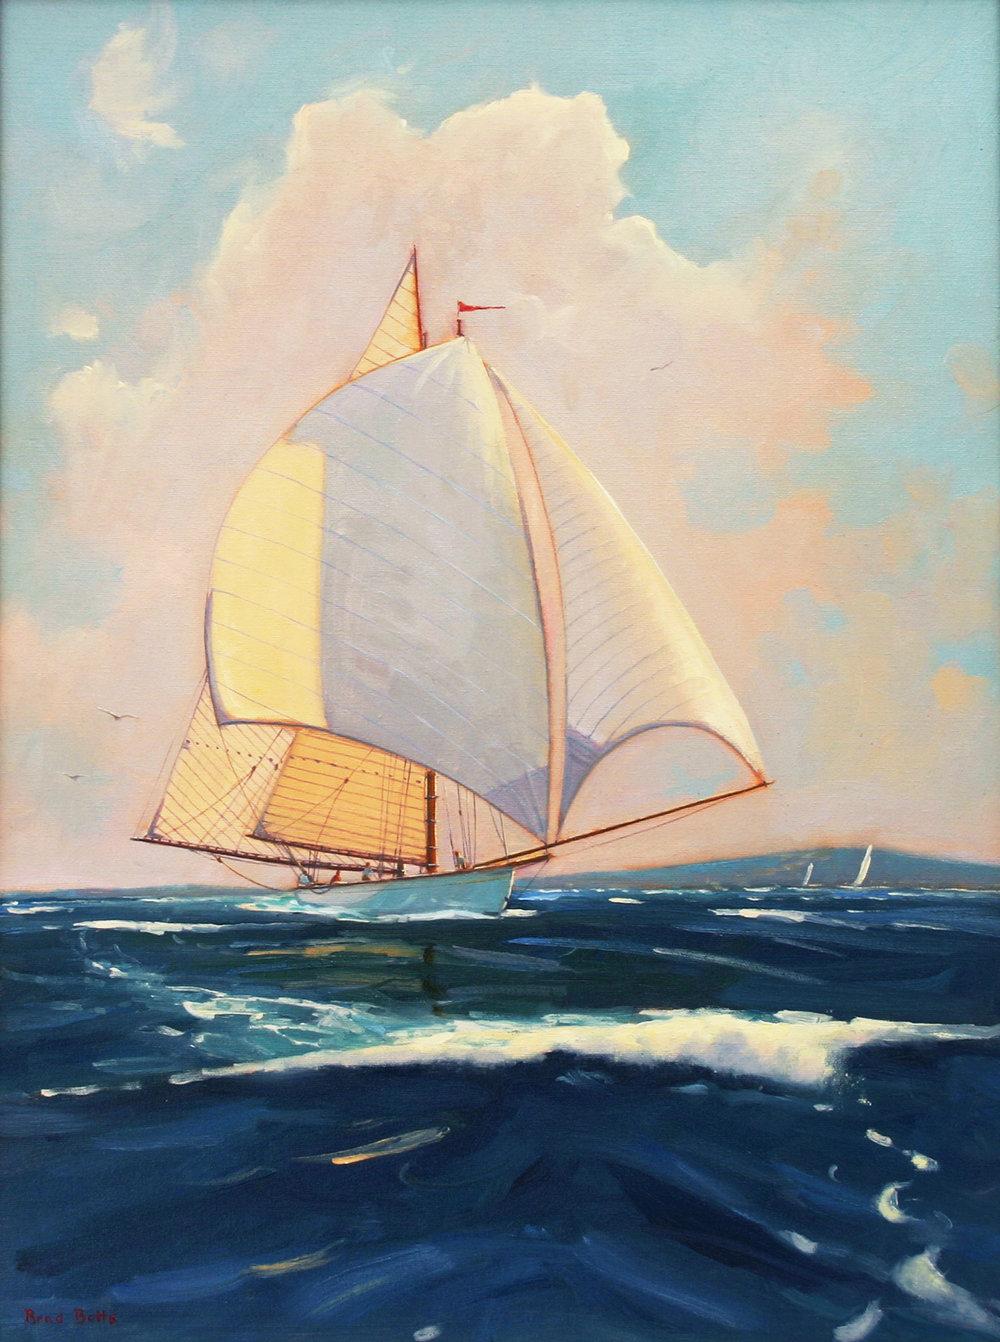 Fair Winds, Following Seas